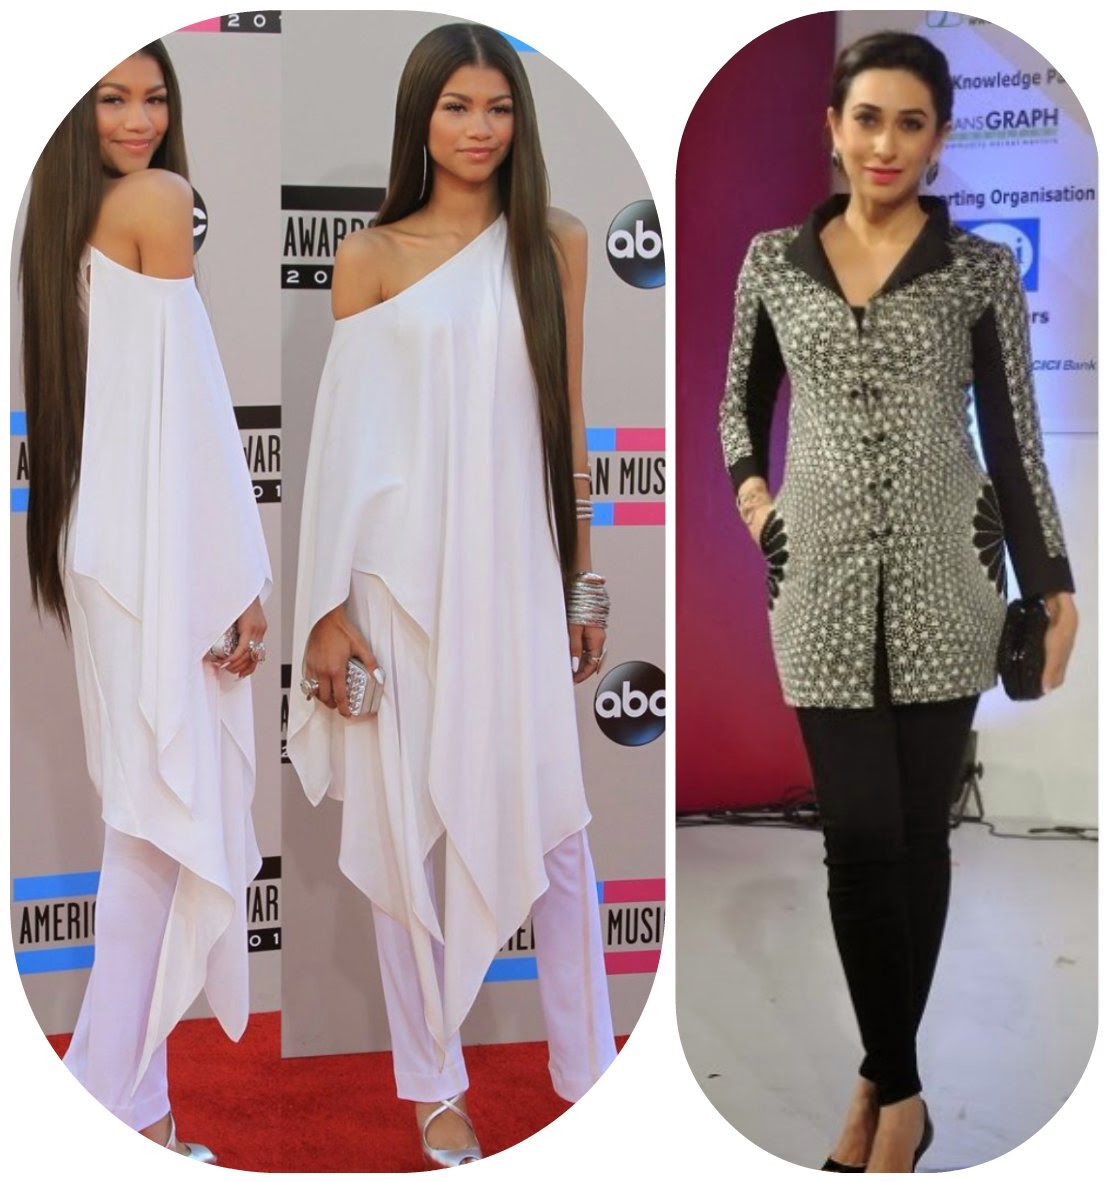 tunic tops, long tunics, fashion style 22015, fashion 2016, fashion in 2015-2016,